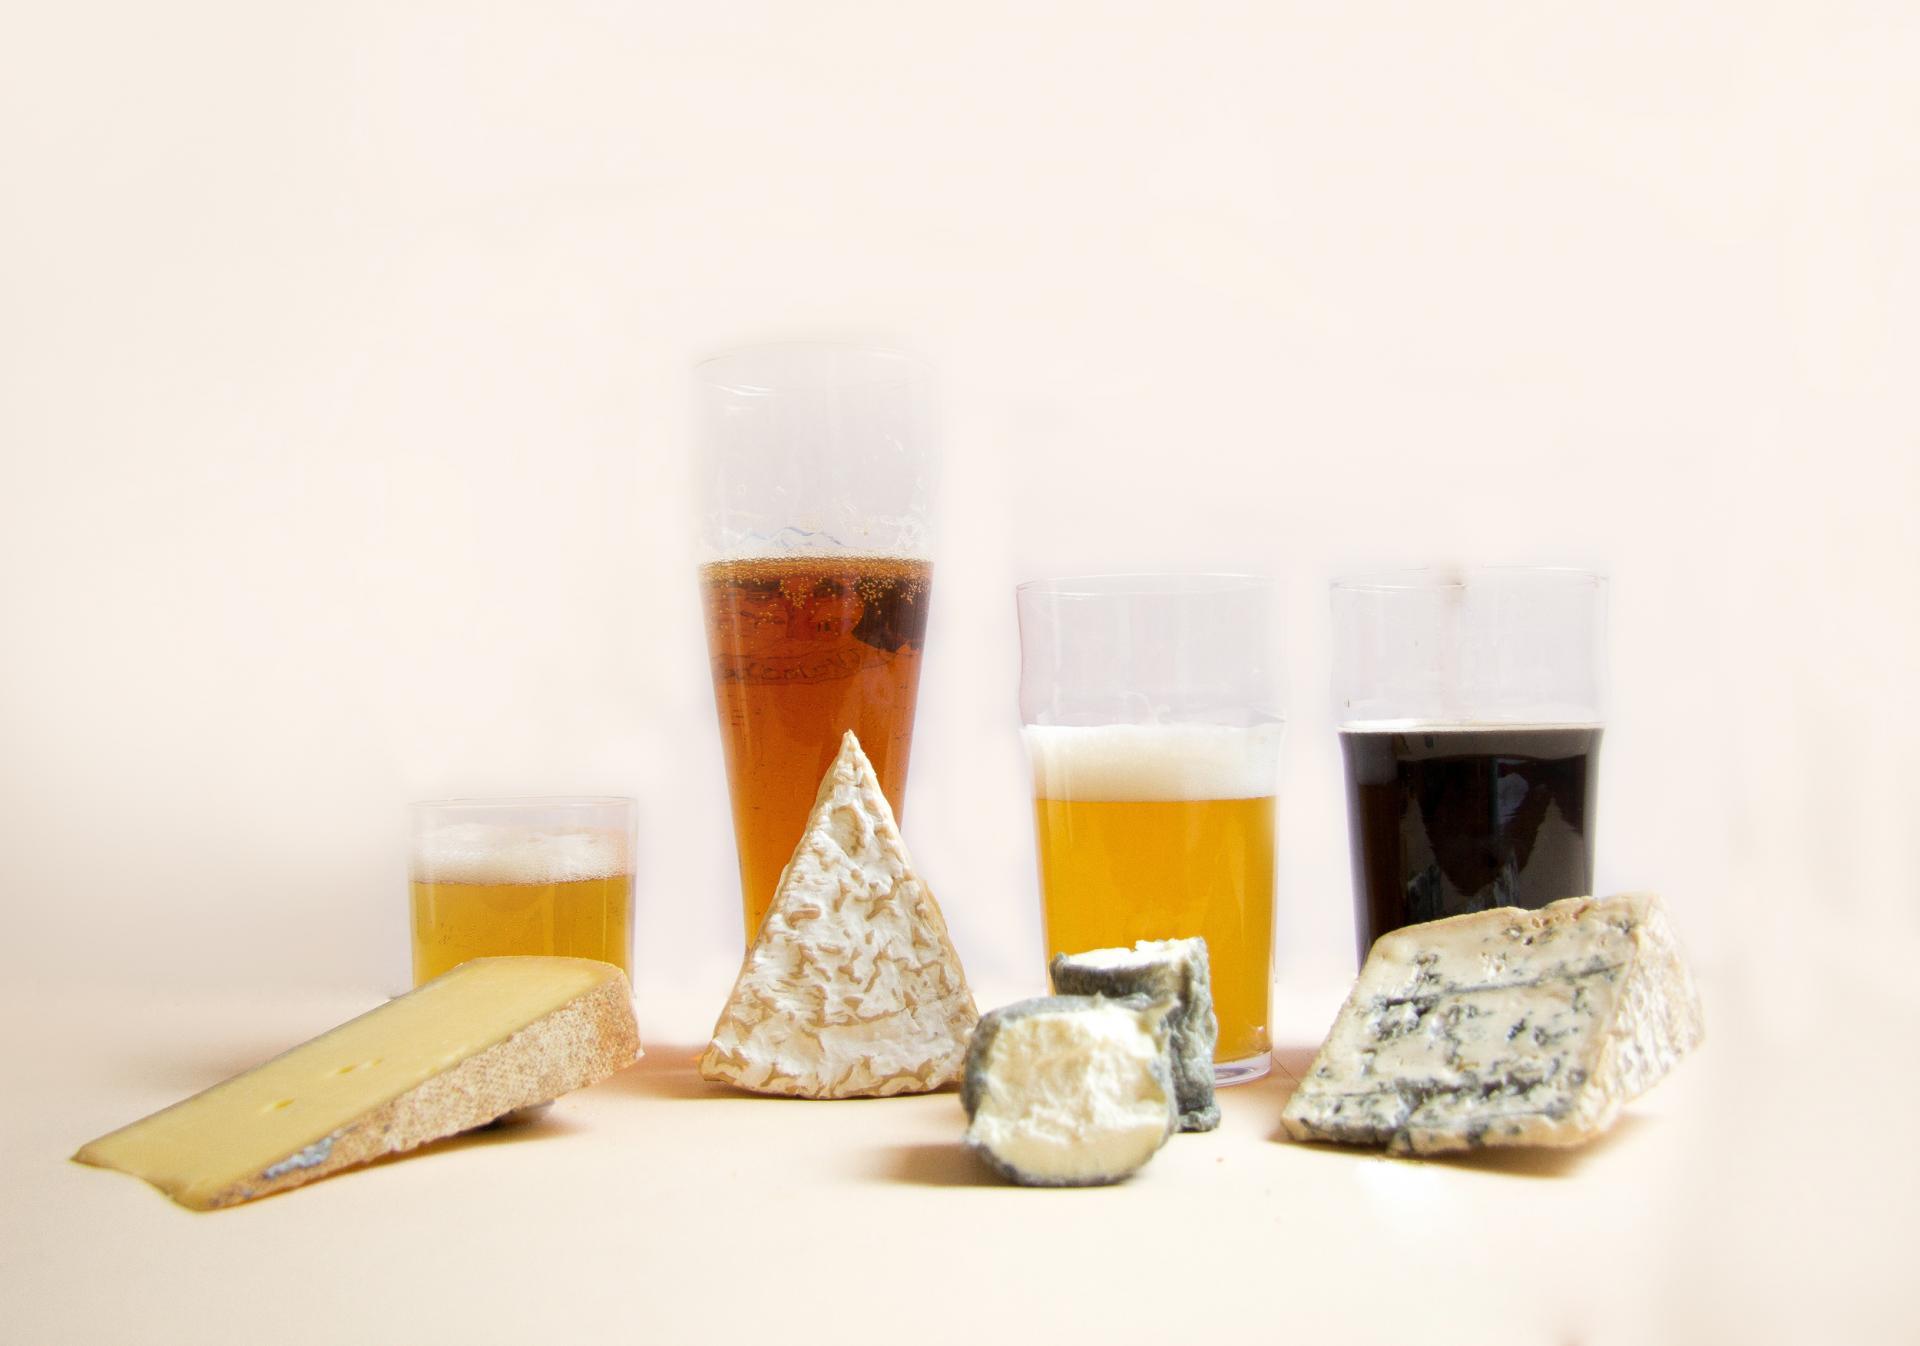 Fromage et biere